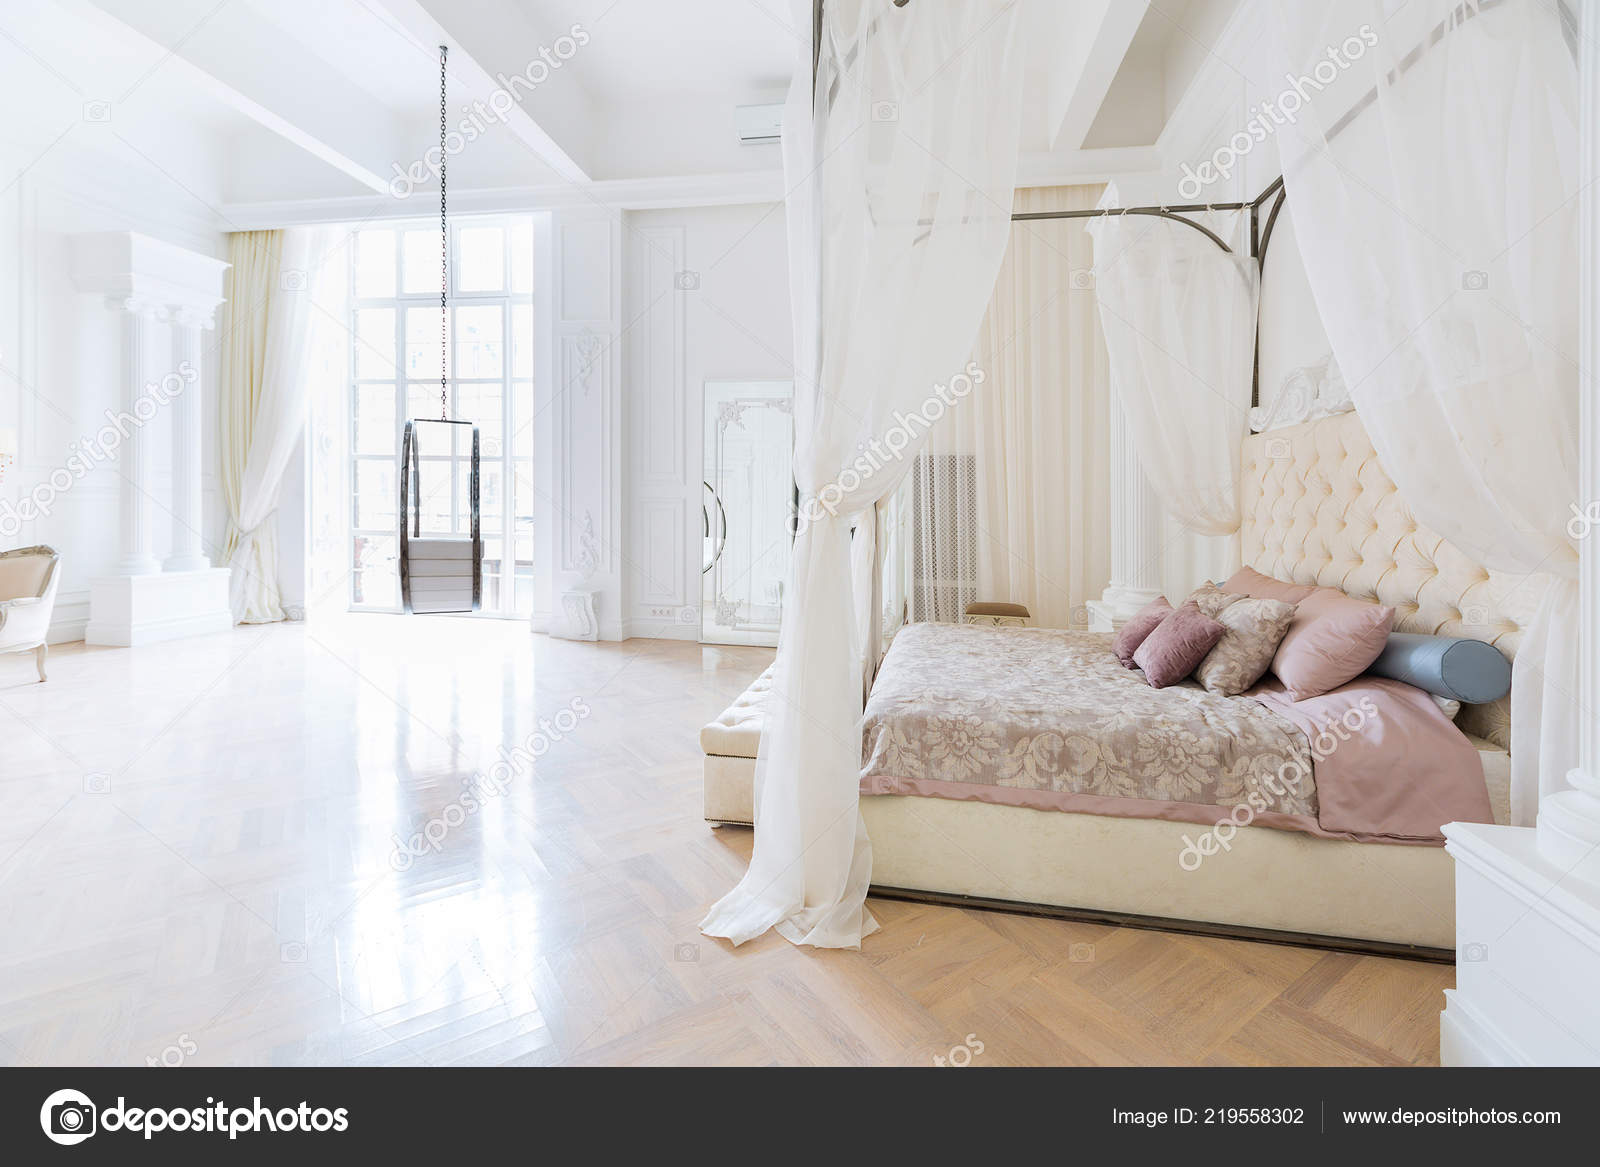 Luxury rich bedroom interior design elegant classic furniture swing shape stock photo